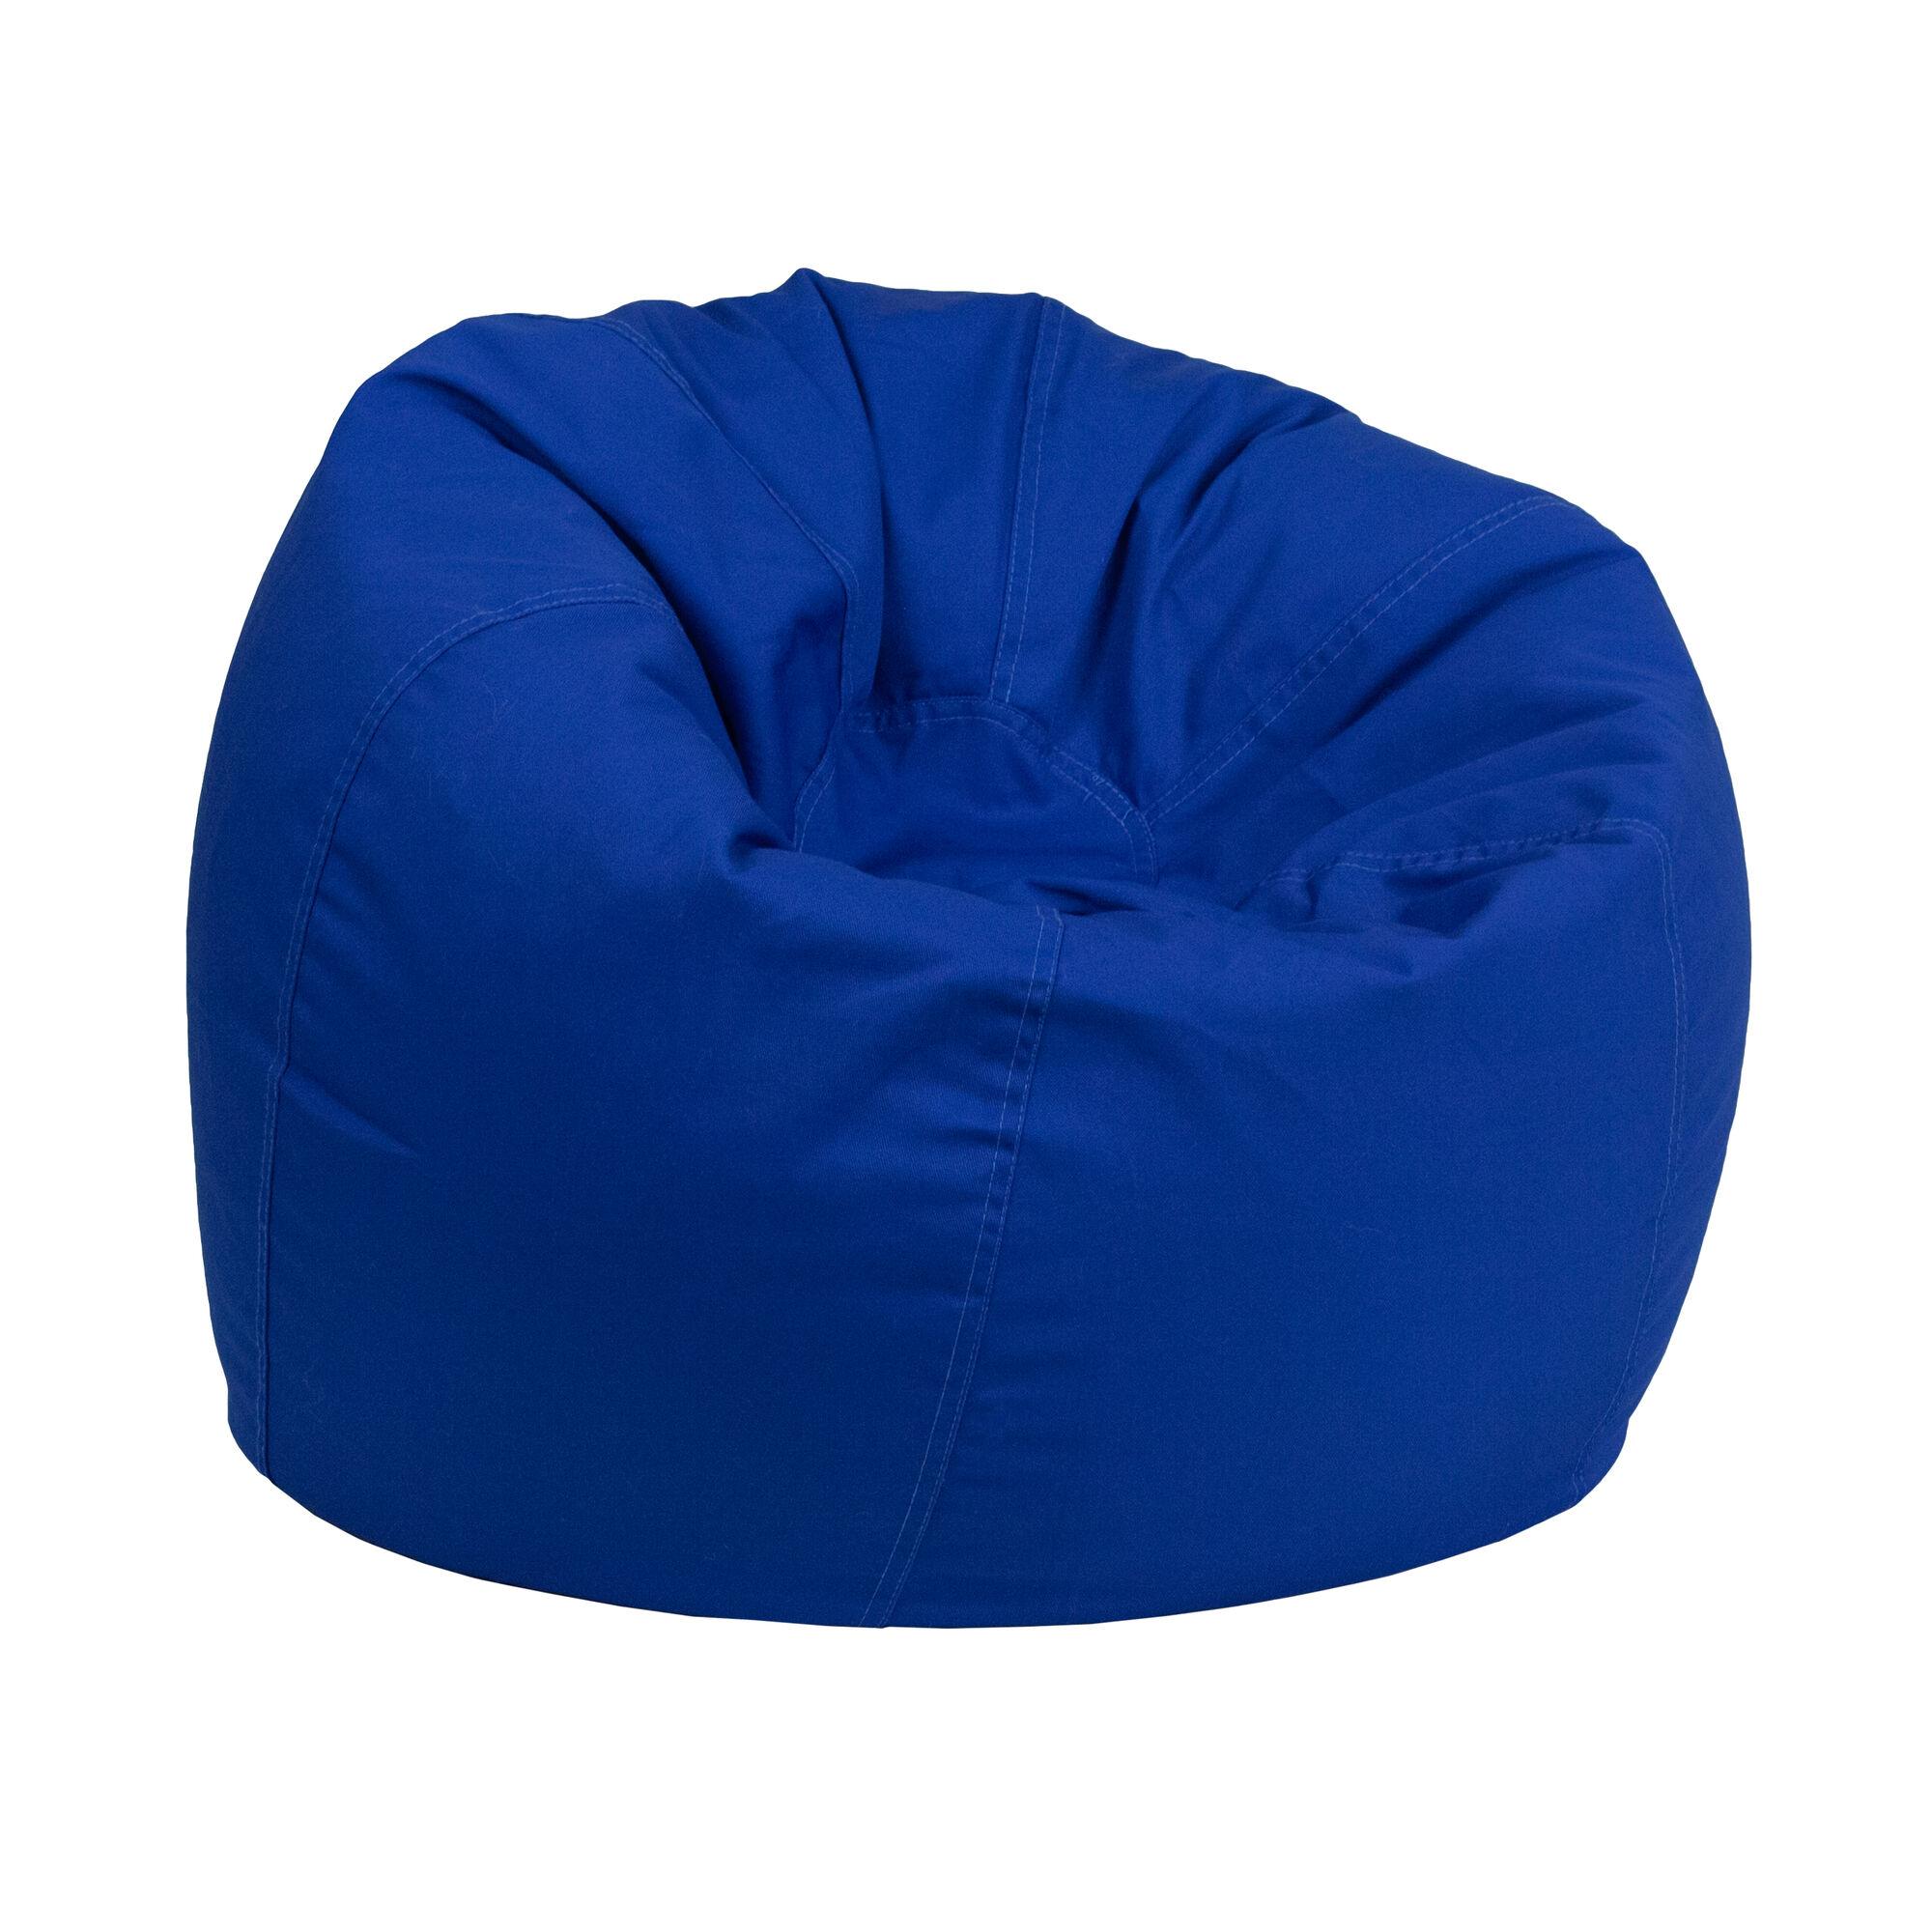 royal blue bean bag chair dg bean small solid roybl gg. Black Bedroom Furniture Sets. Home Design Ideas